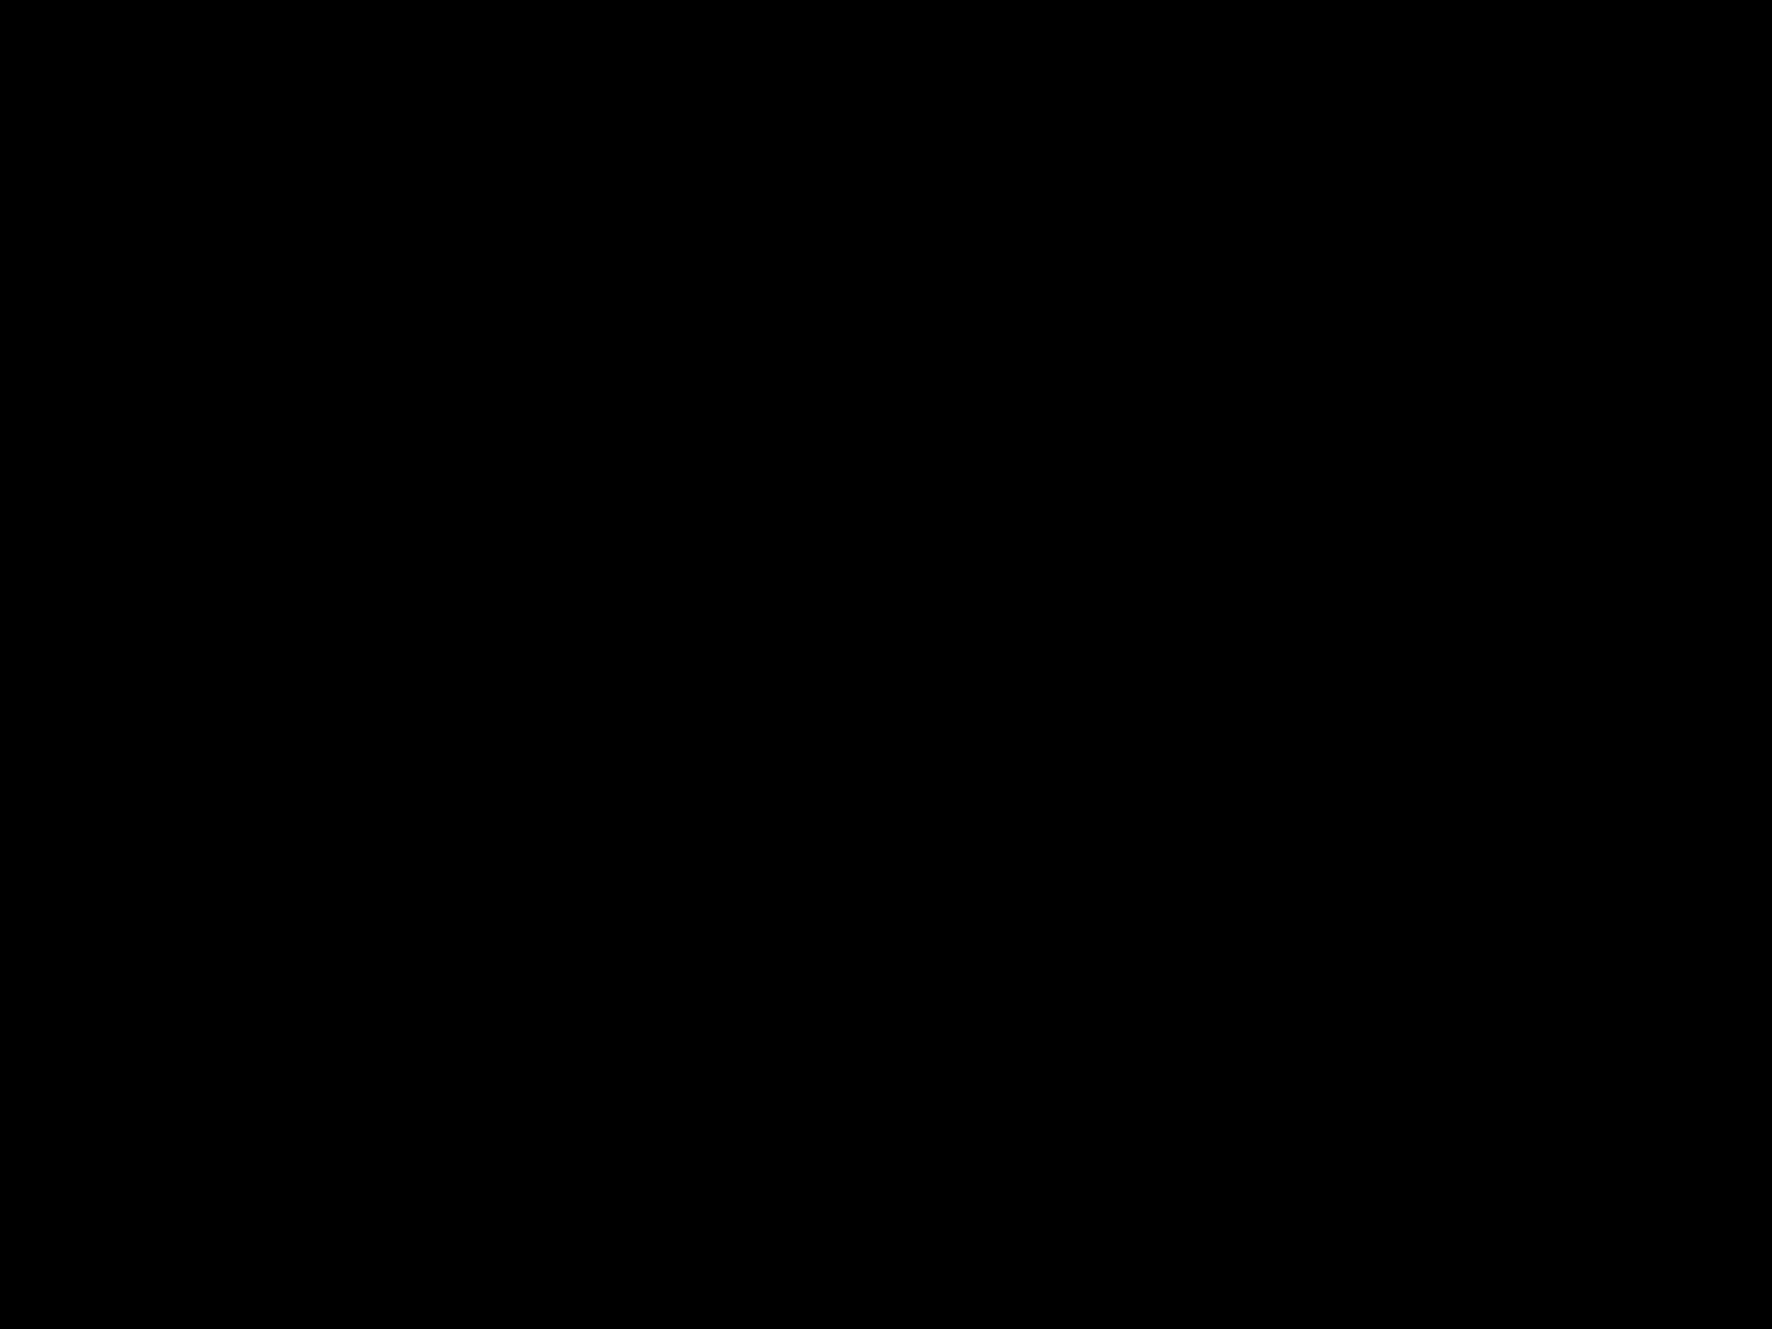 Loewe bild 4.55